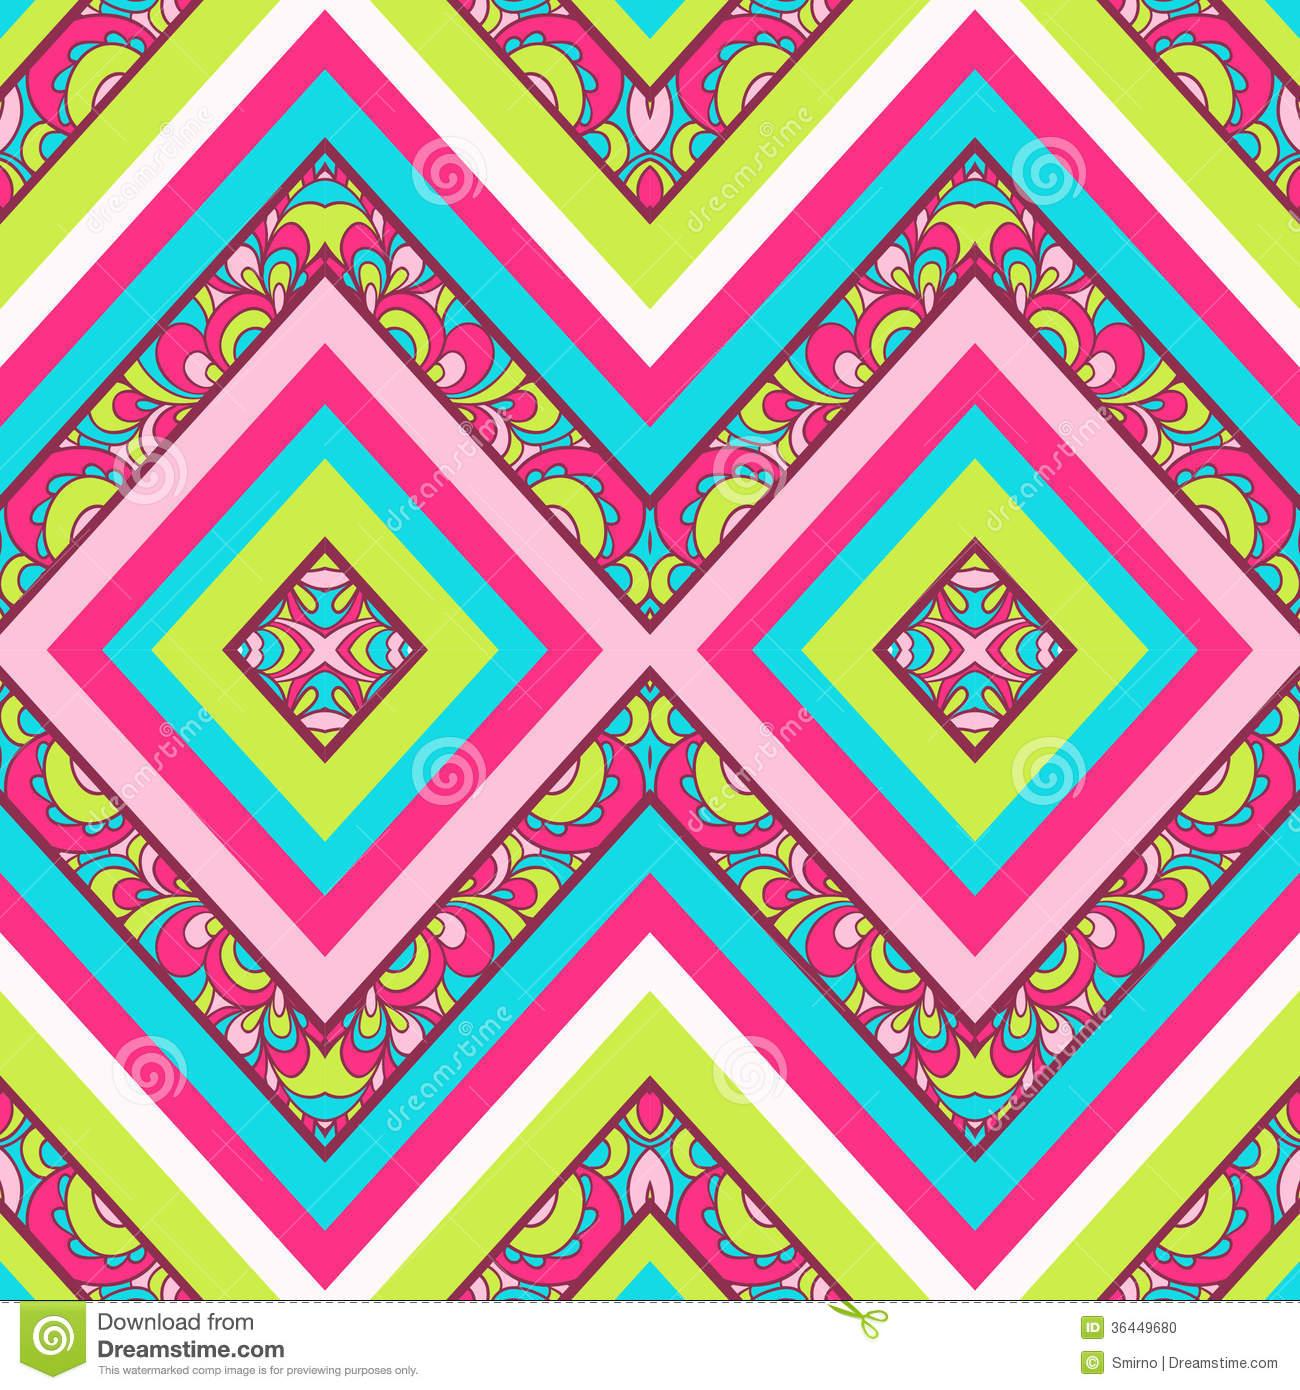 Zig Zag Background for Pinterest 1300x1390